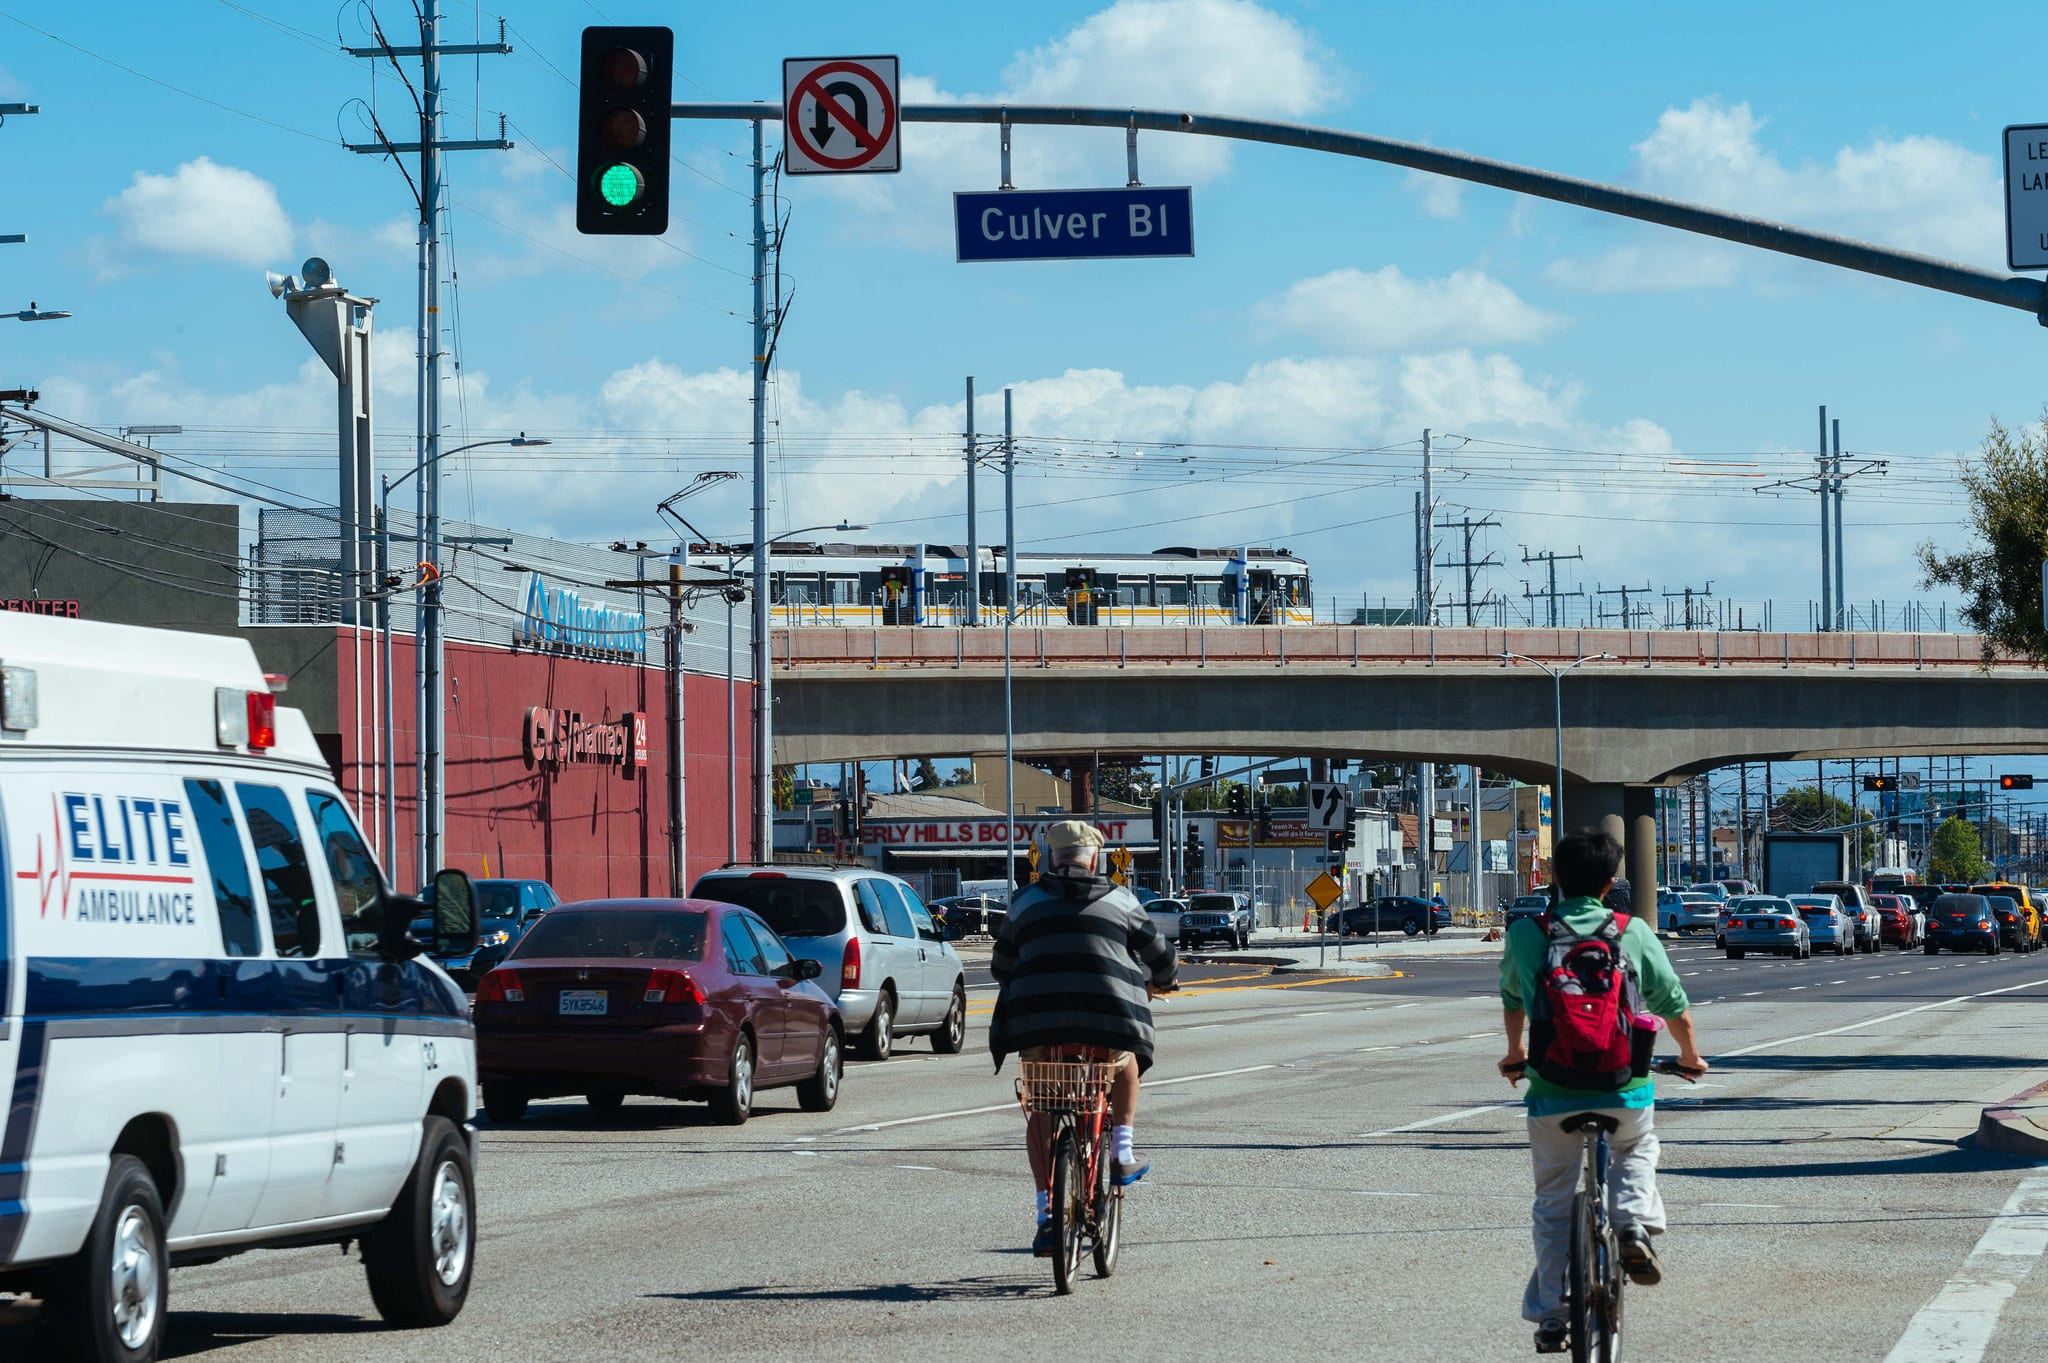 The bridge over Venice Boulevard unfamiliar to David Ulin. Photo by Steve Hymon/Metro.